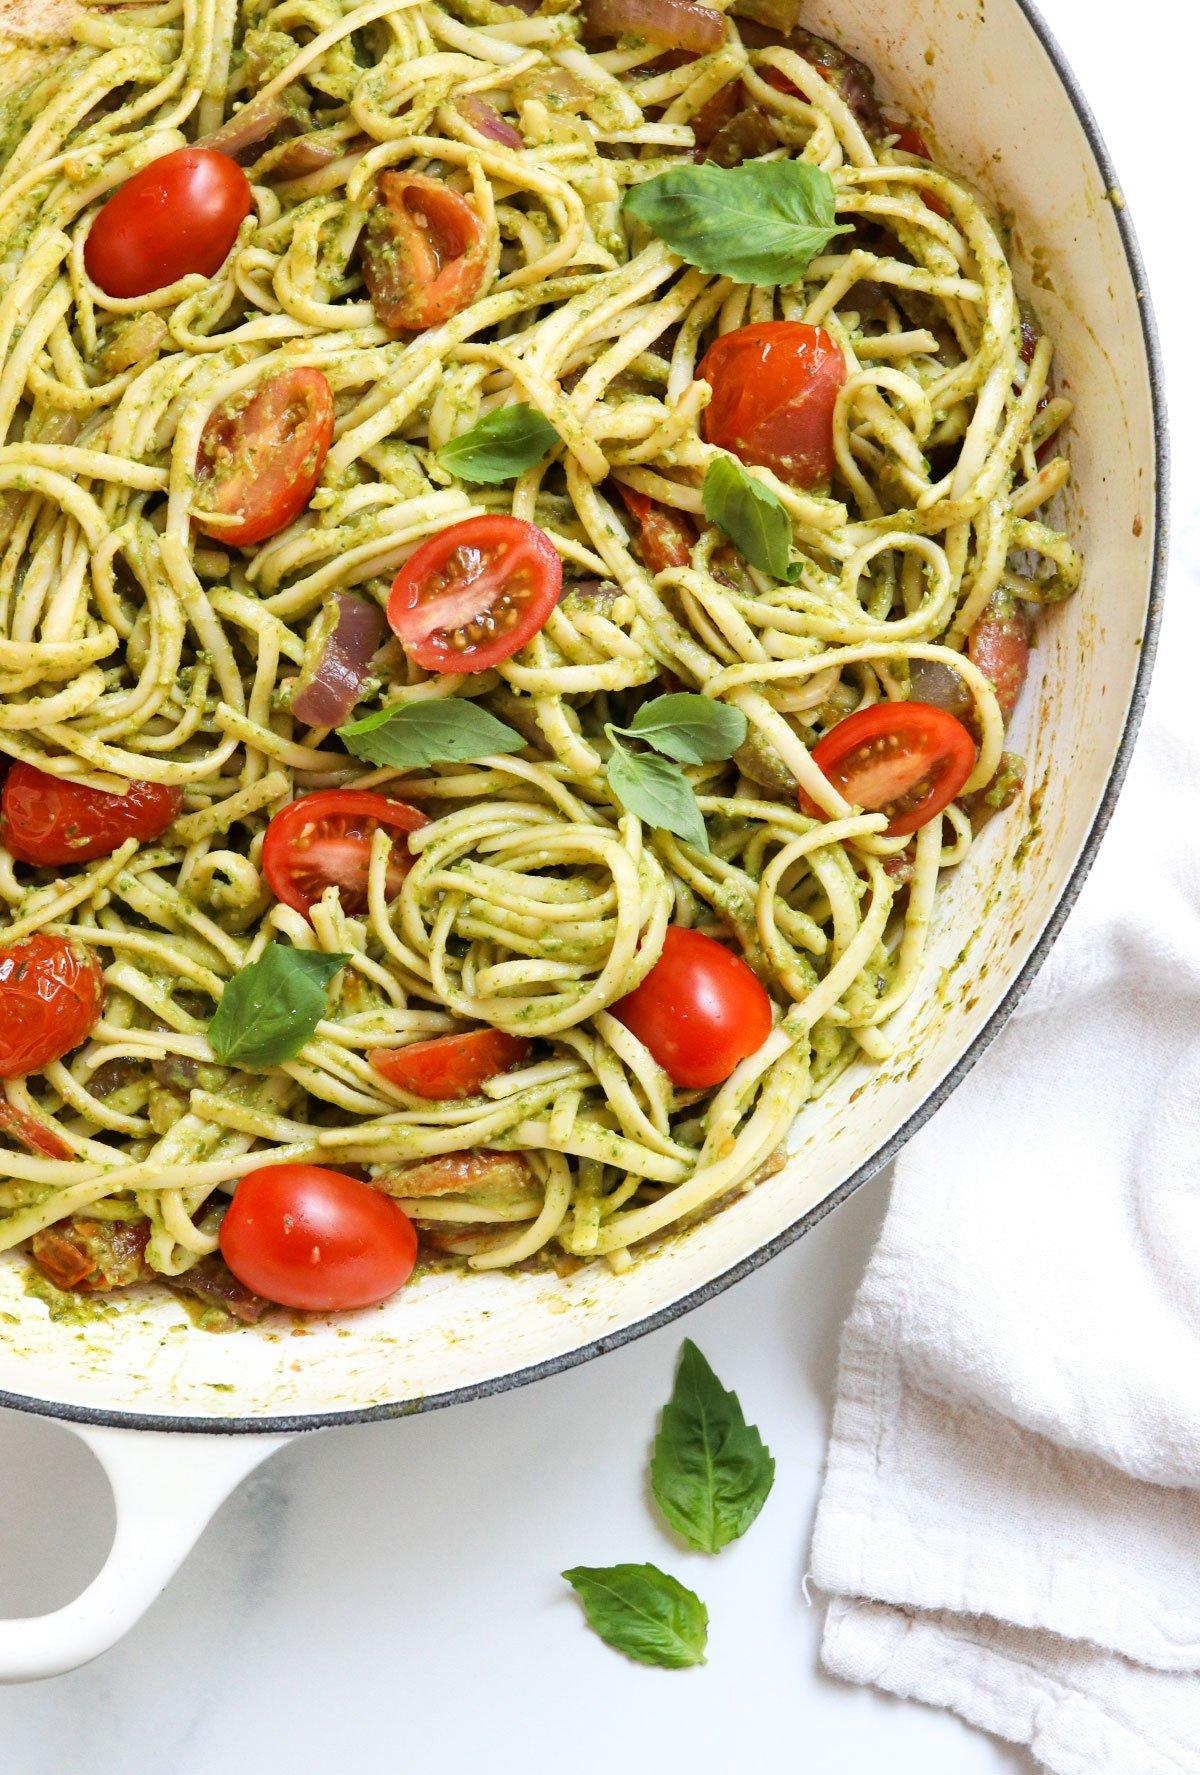 pesto pasta with tomatoes and fresh basil